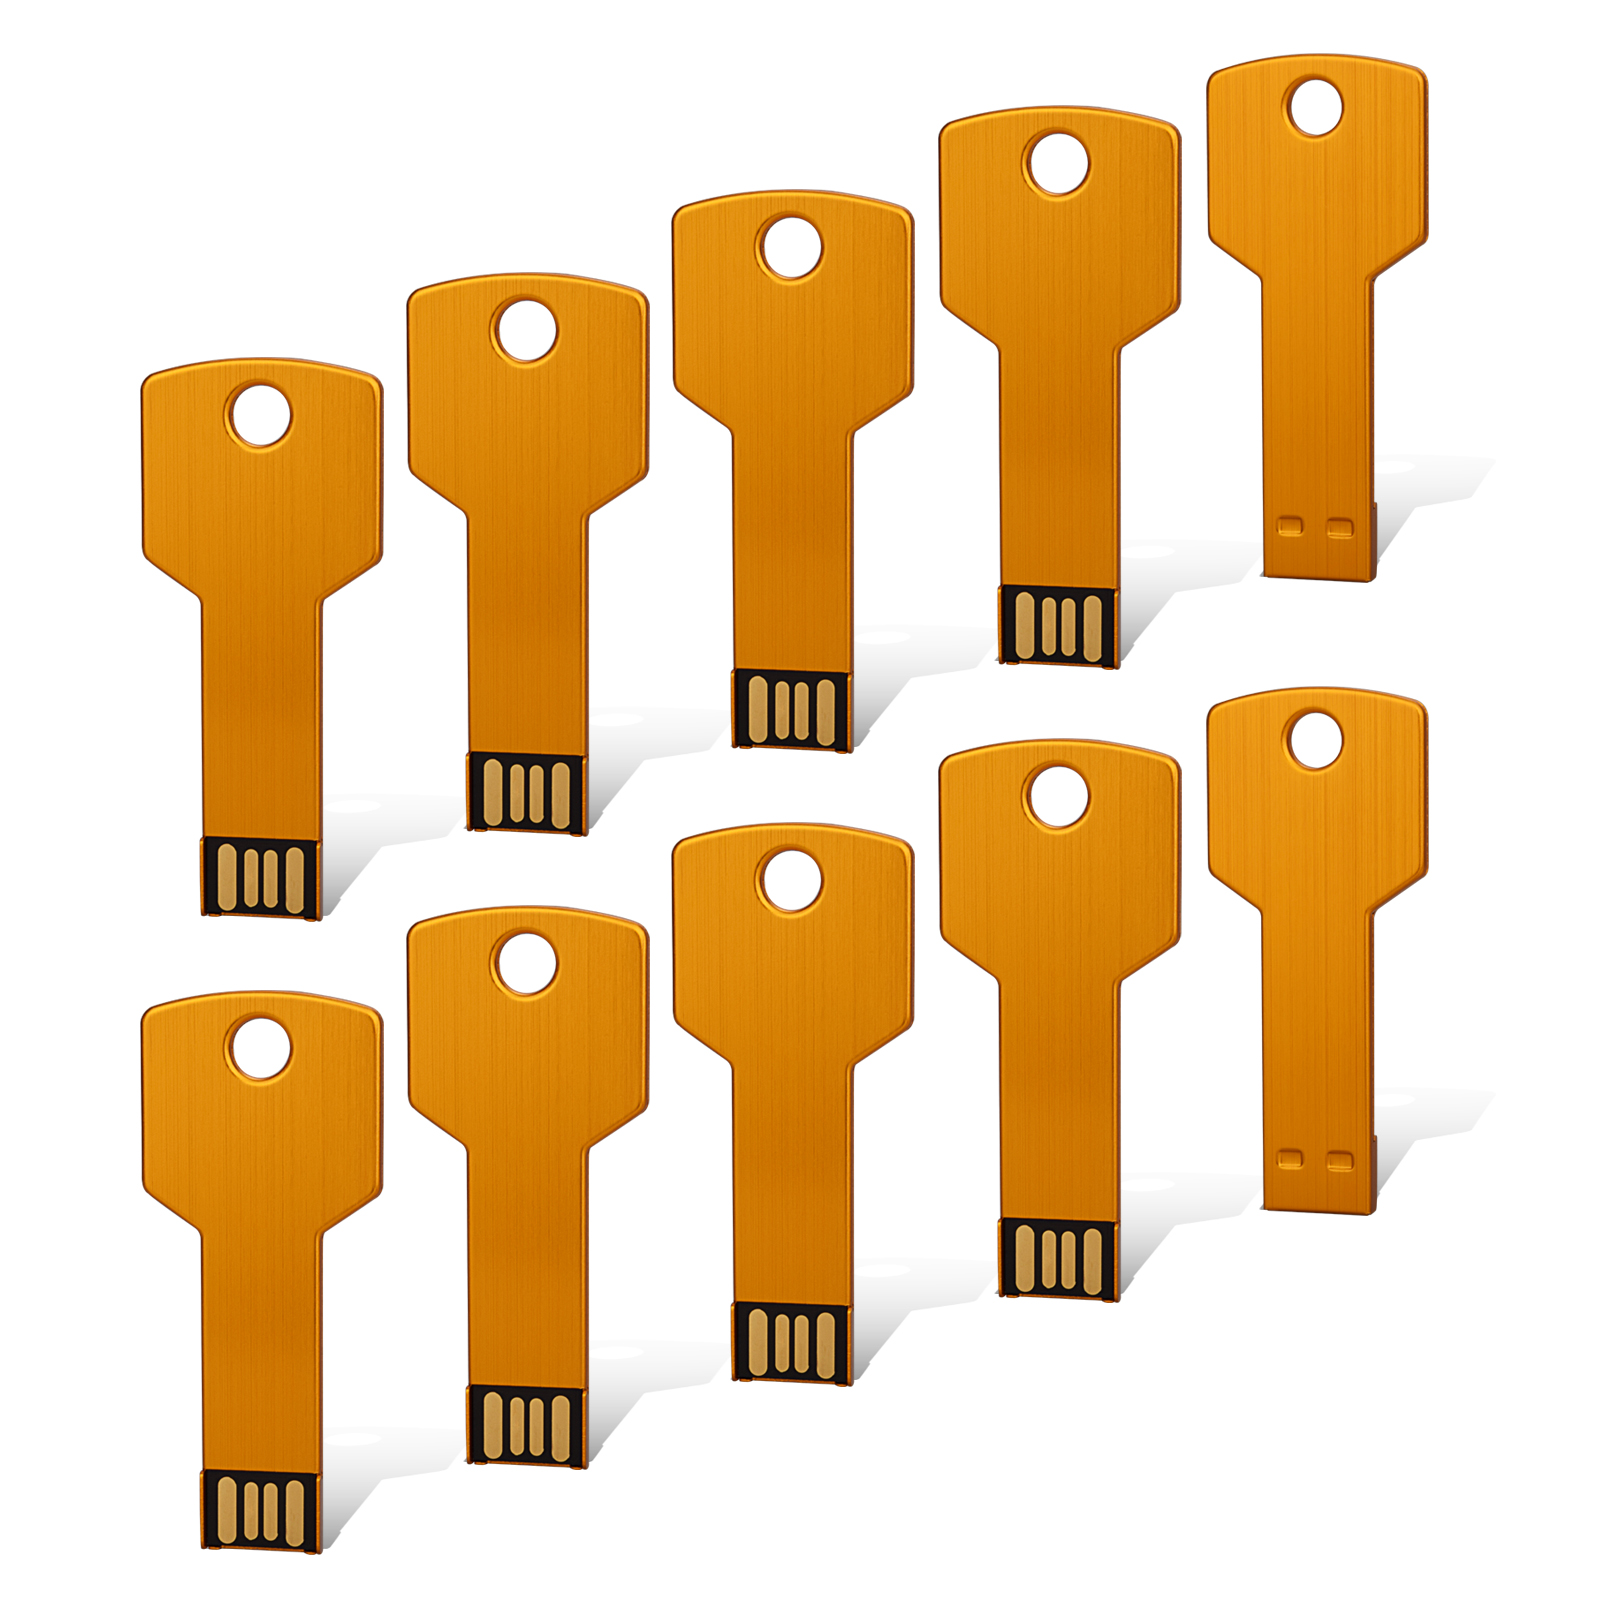 KOOTION 10Pack 4GB Metal Key Design USB Flash Drive, Metal Key Shaped Memory Stick, USB 2.0, Gold